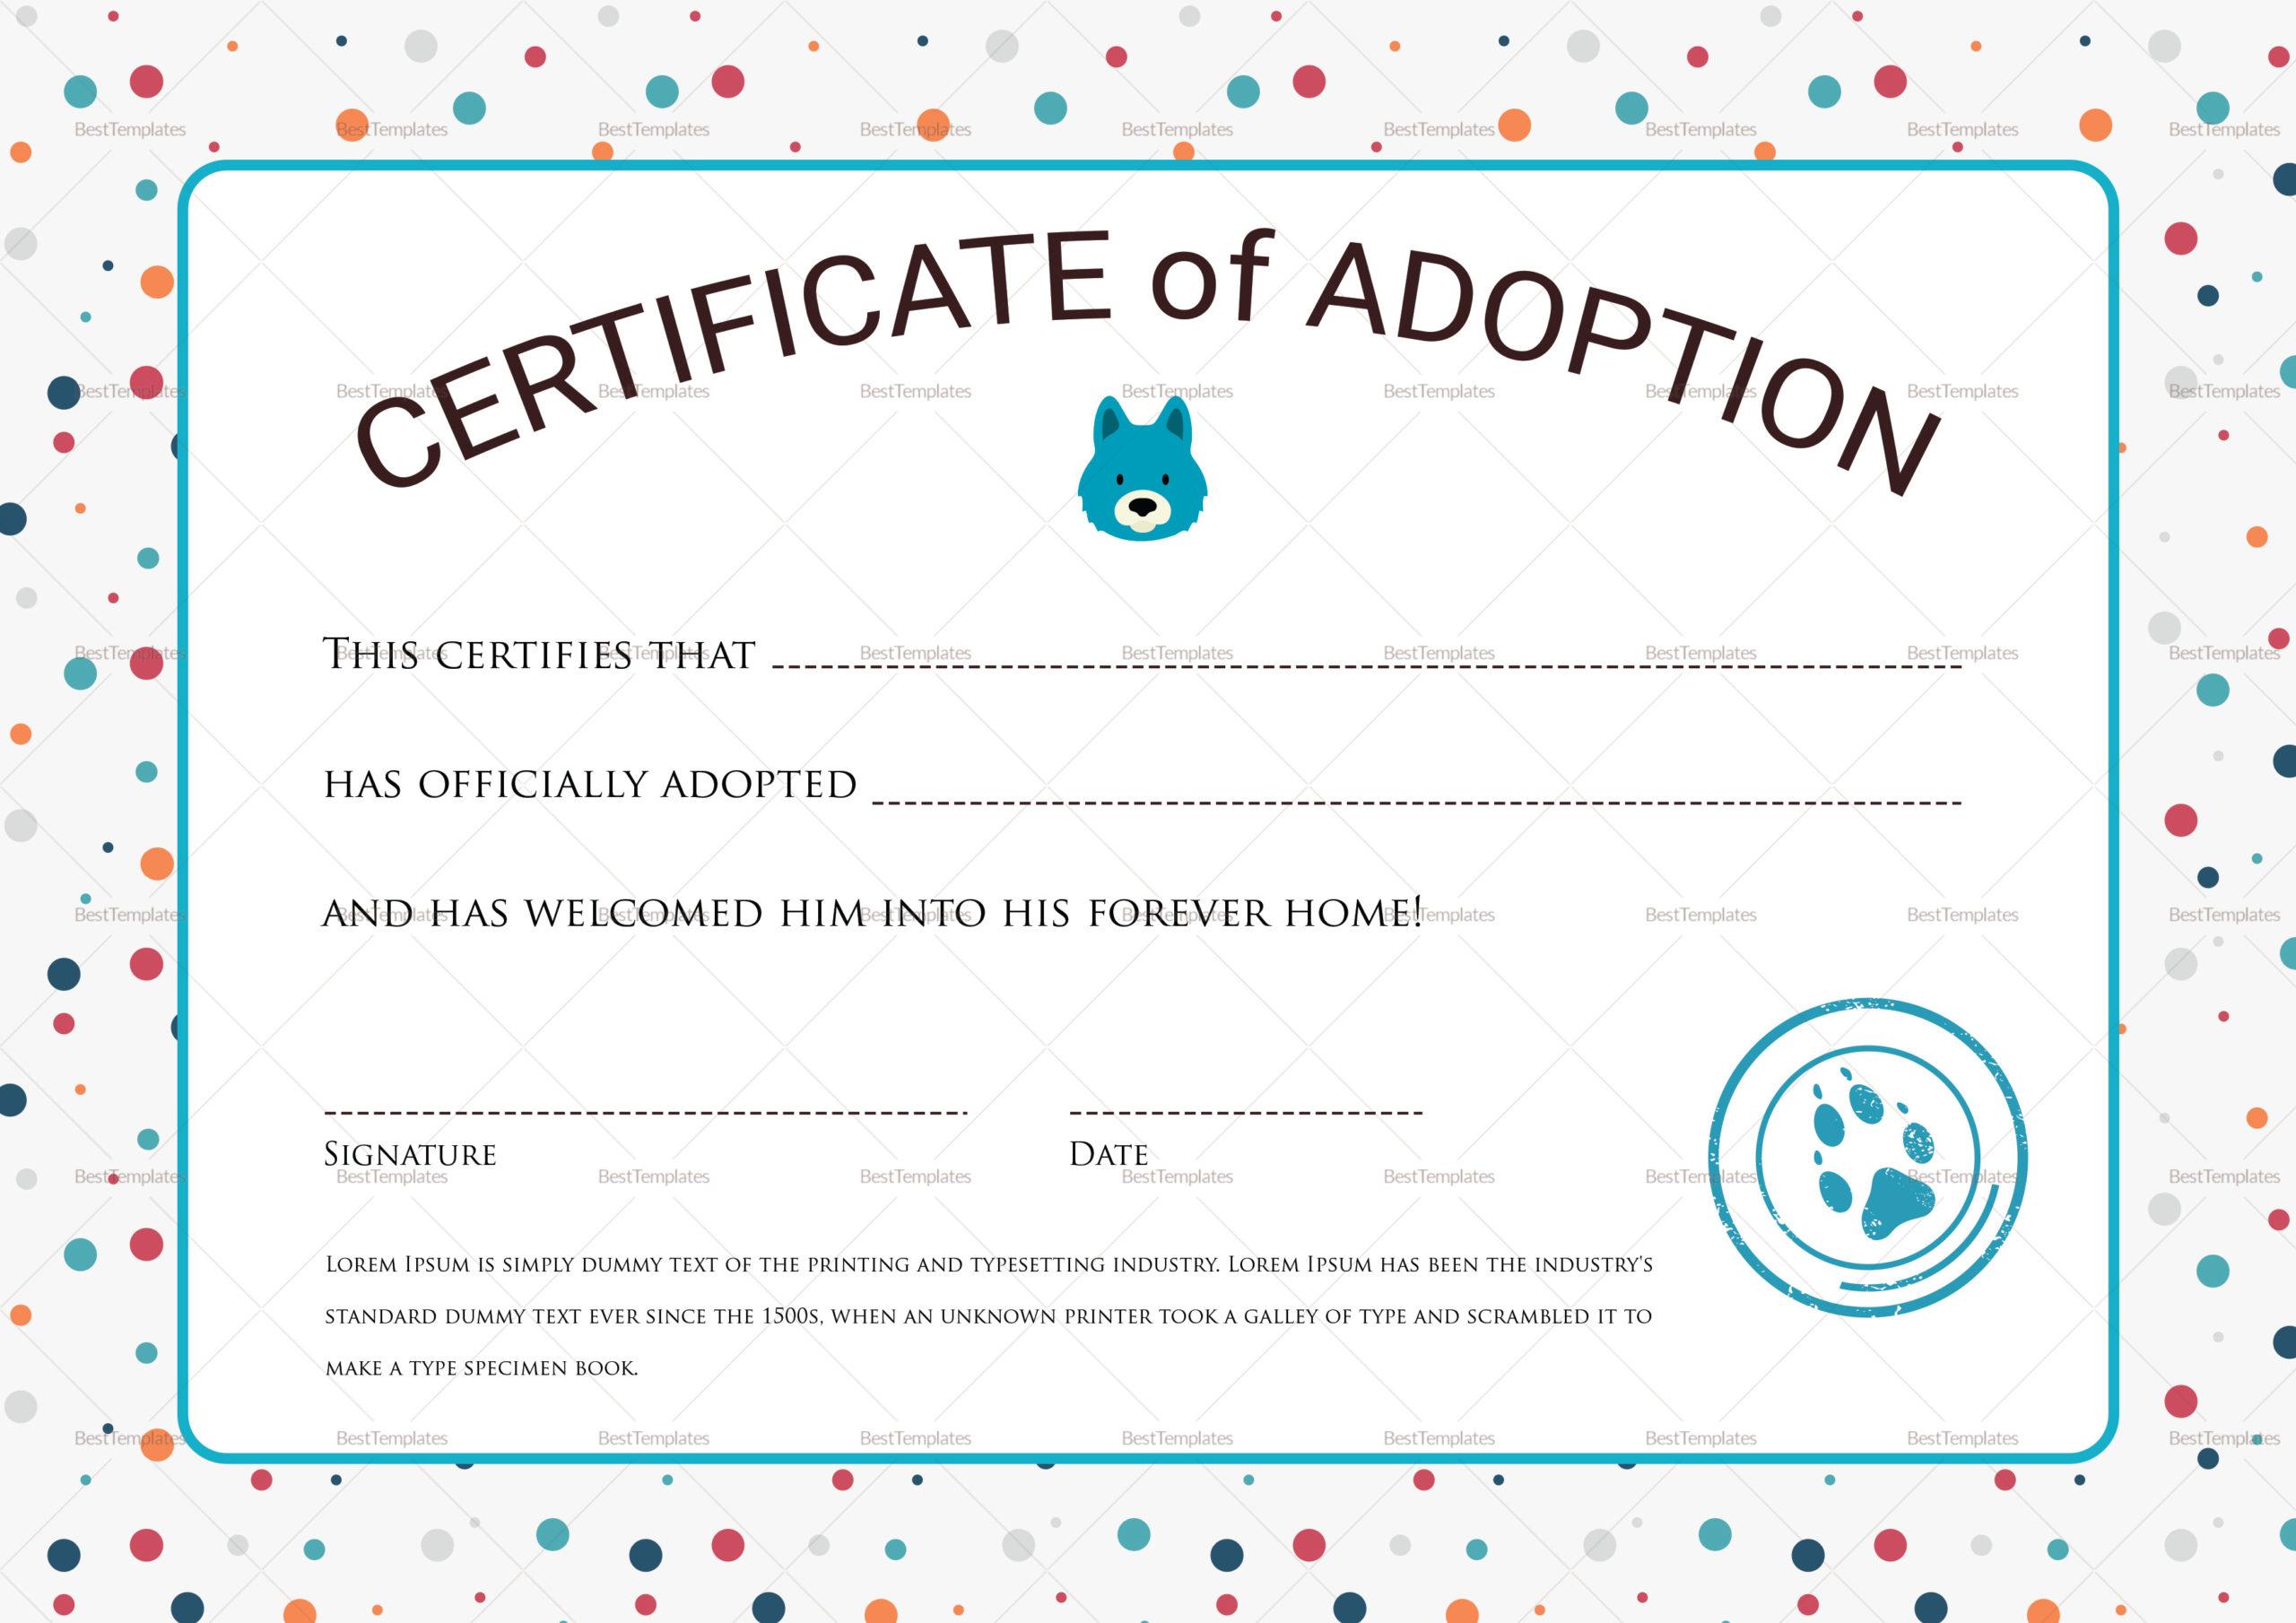 Certificate Of Adoption Design Template In Psd Word regarding Dog Adoption Certificate Editable Templates